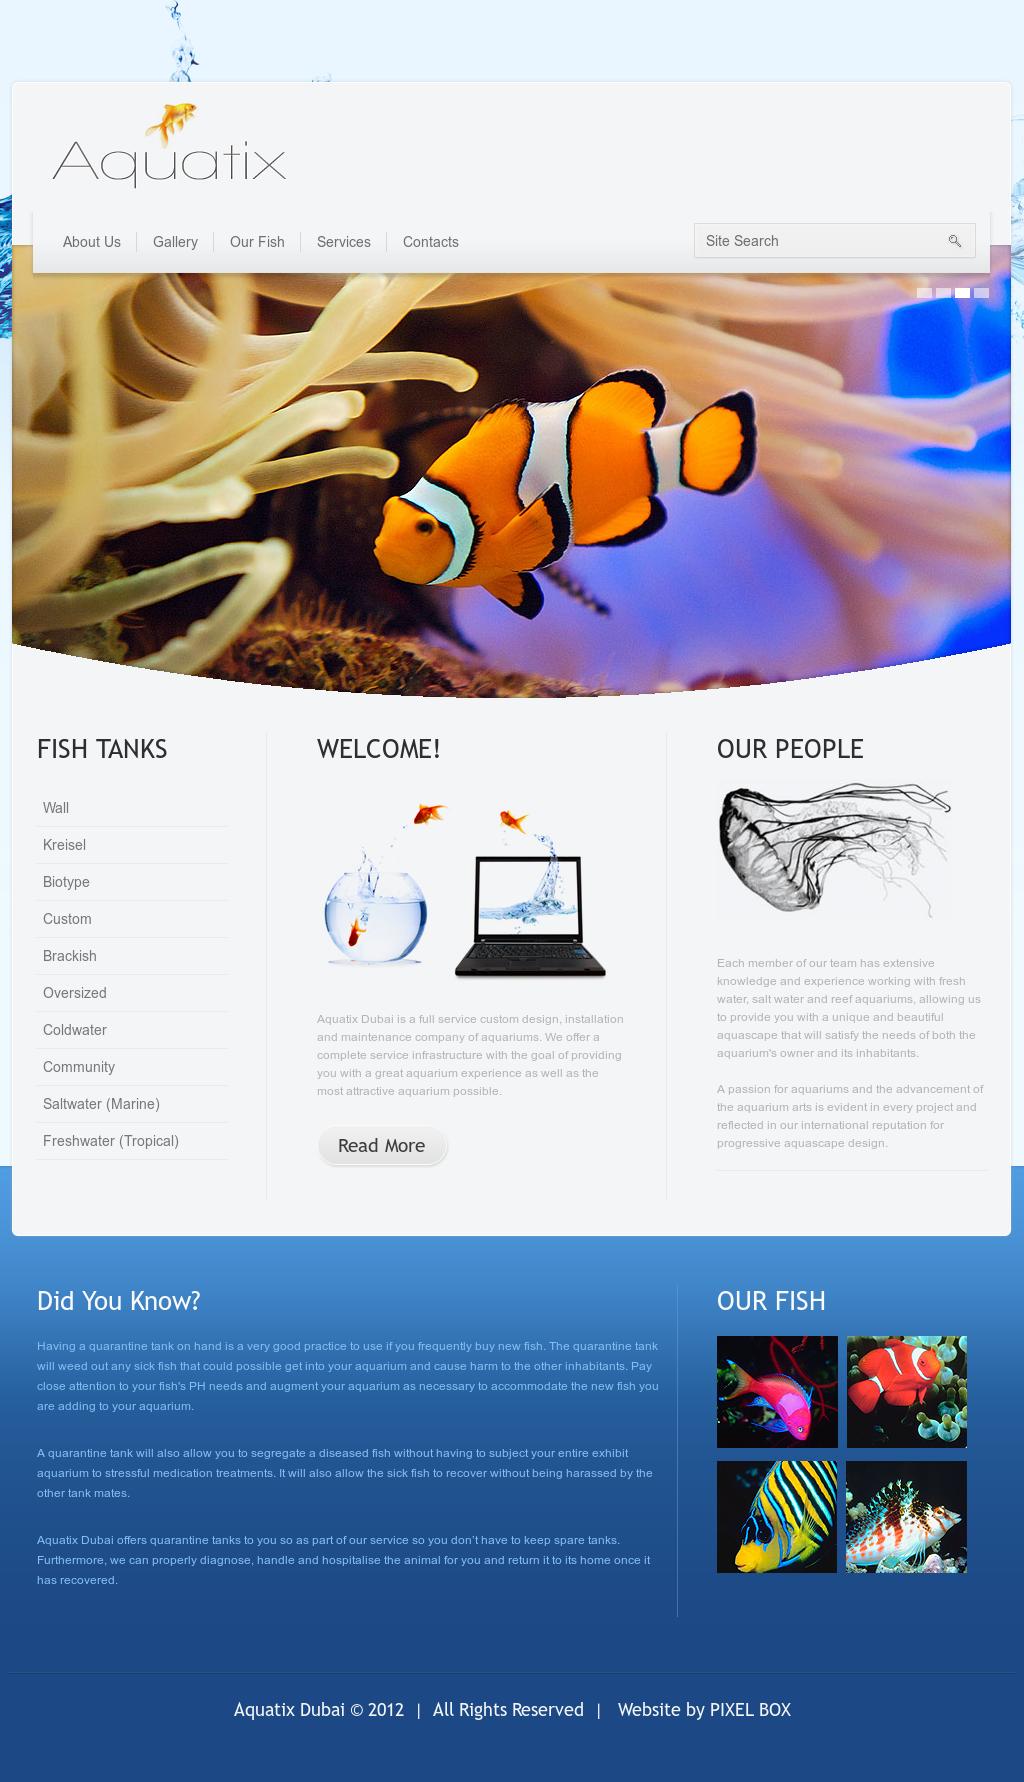 Aquatix Dubai Competitors, Revenue and Employees - Owler